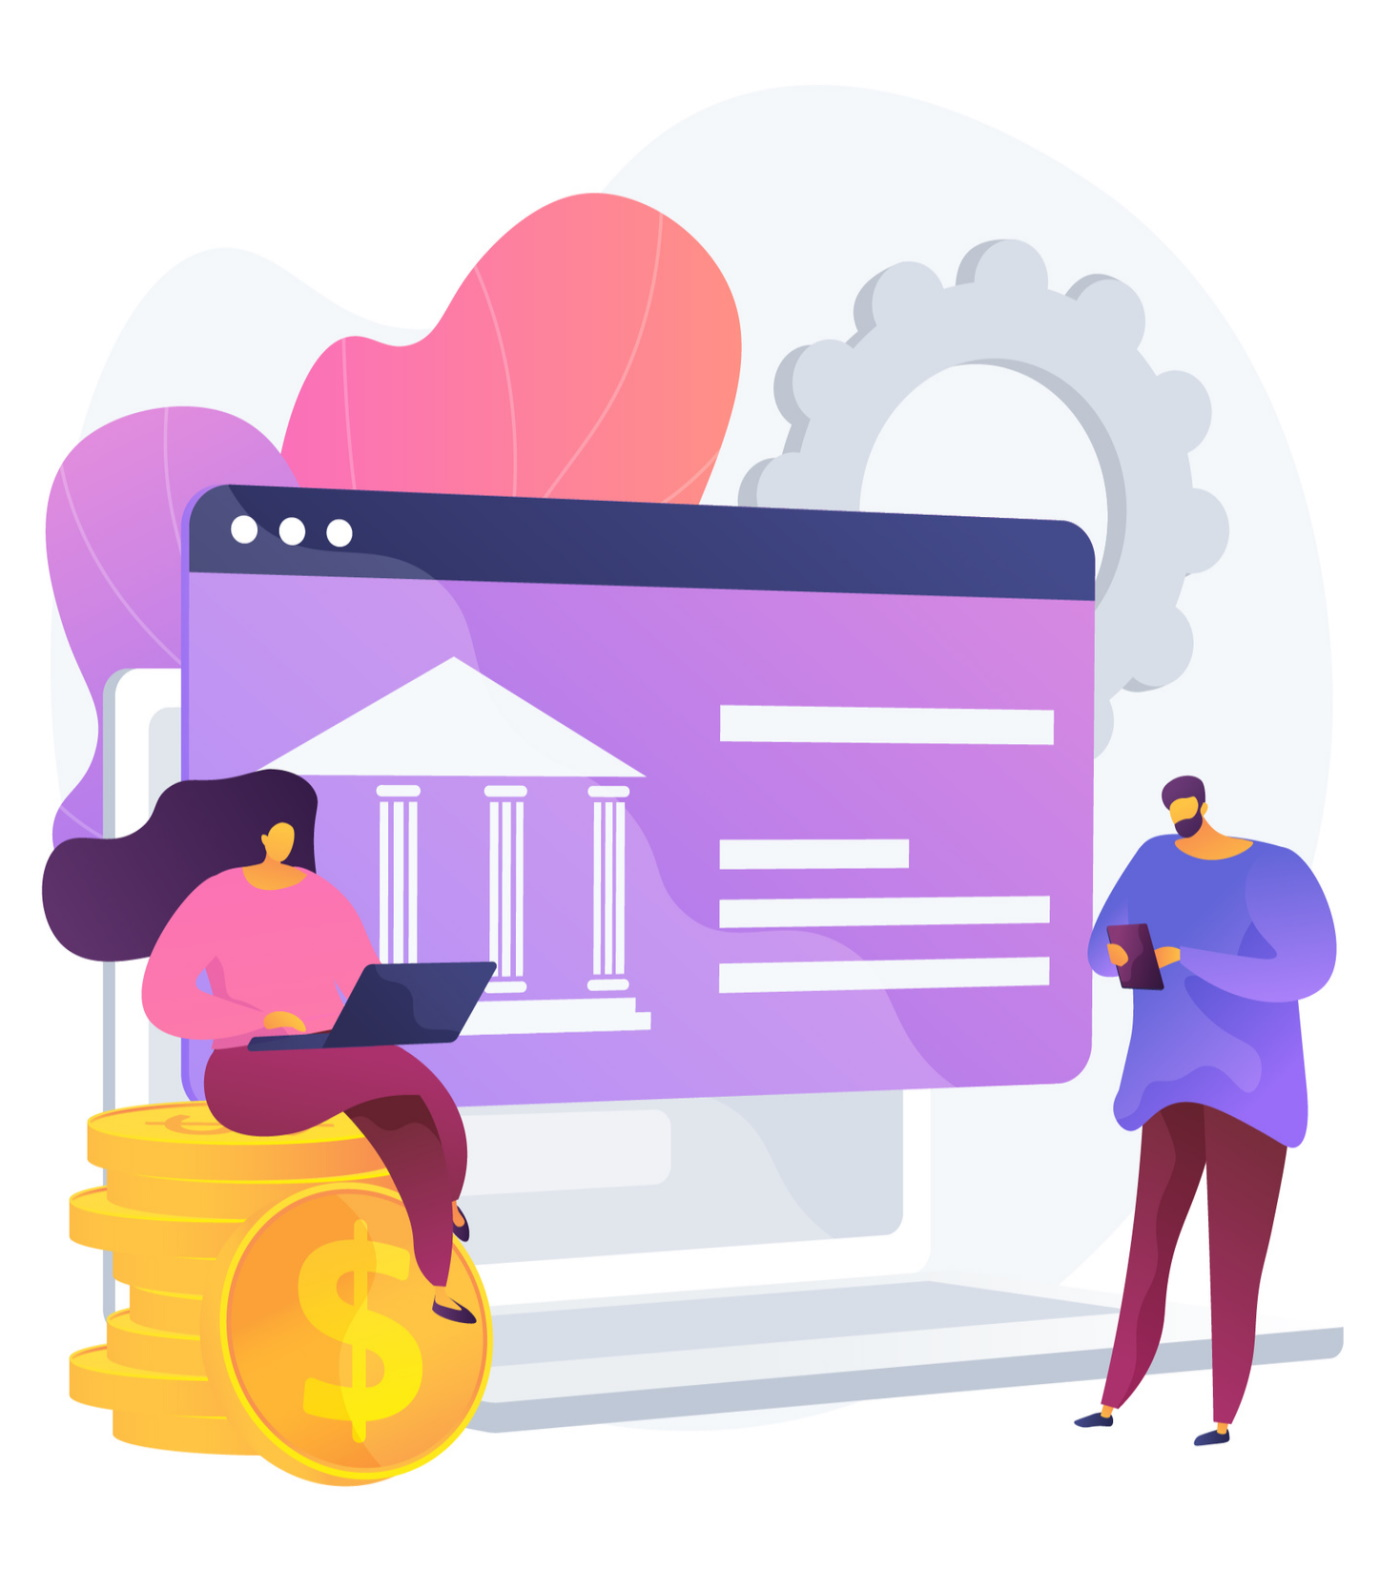 CDTenlinea.com compramos tu CDT - Homepage 2021 v1.1